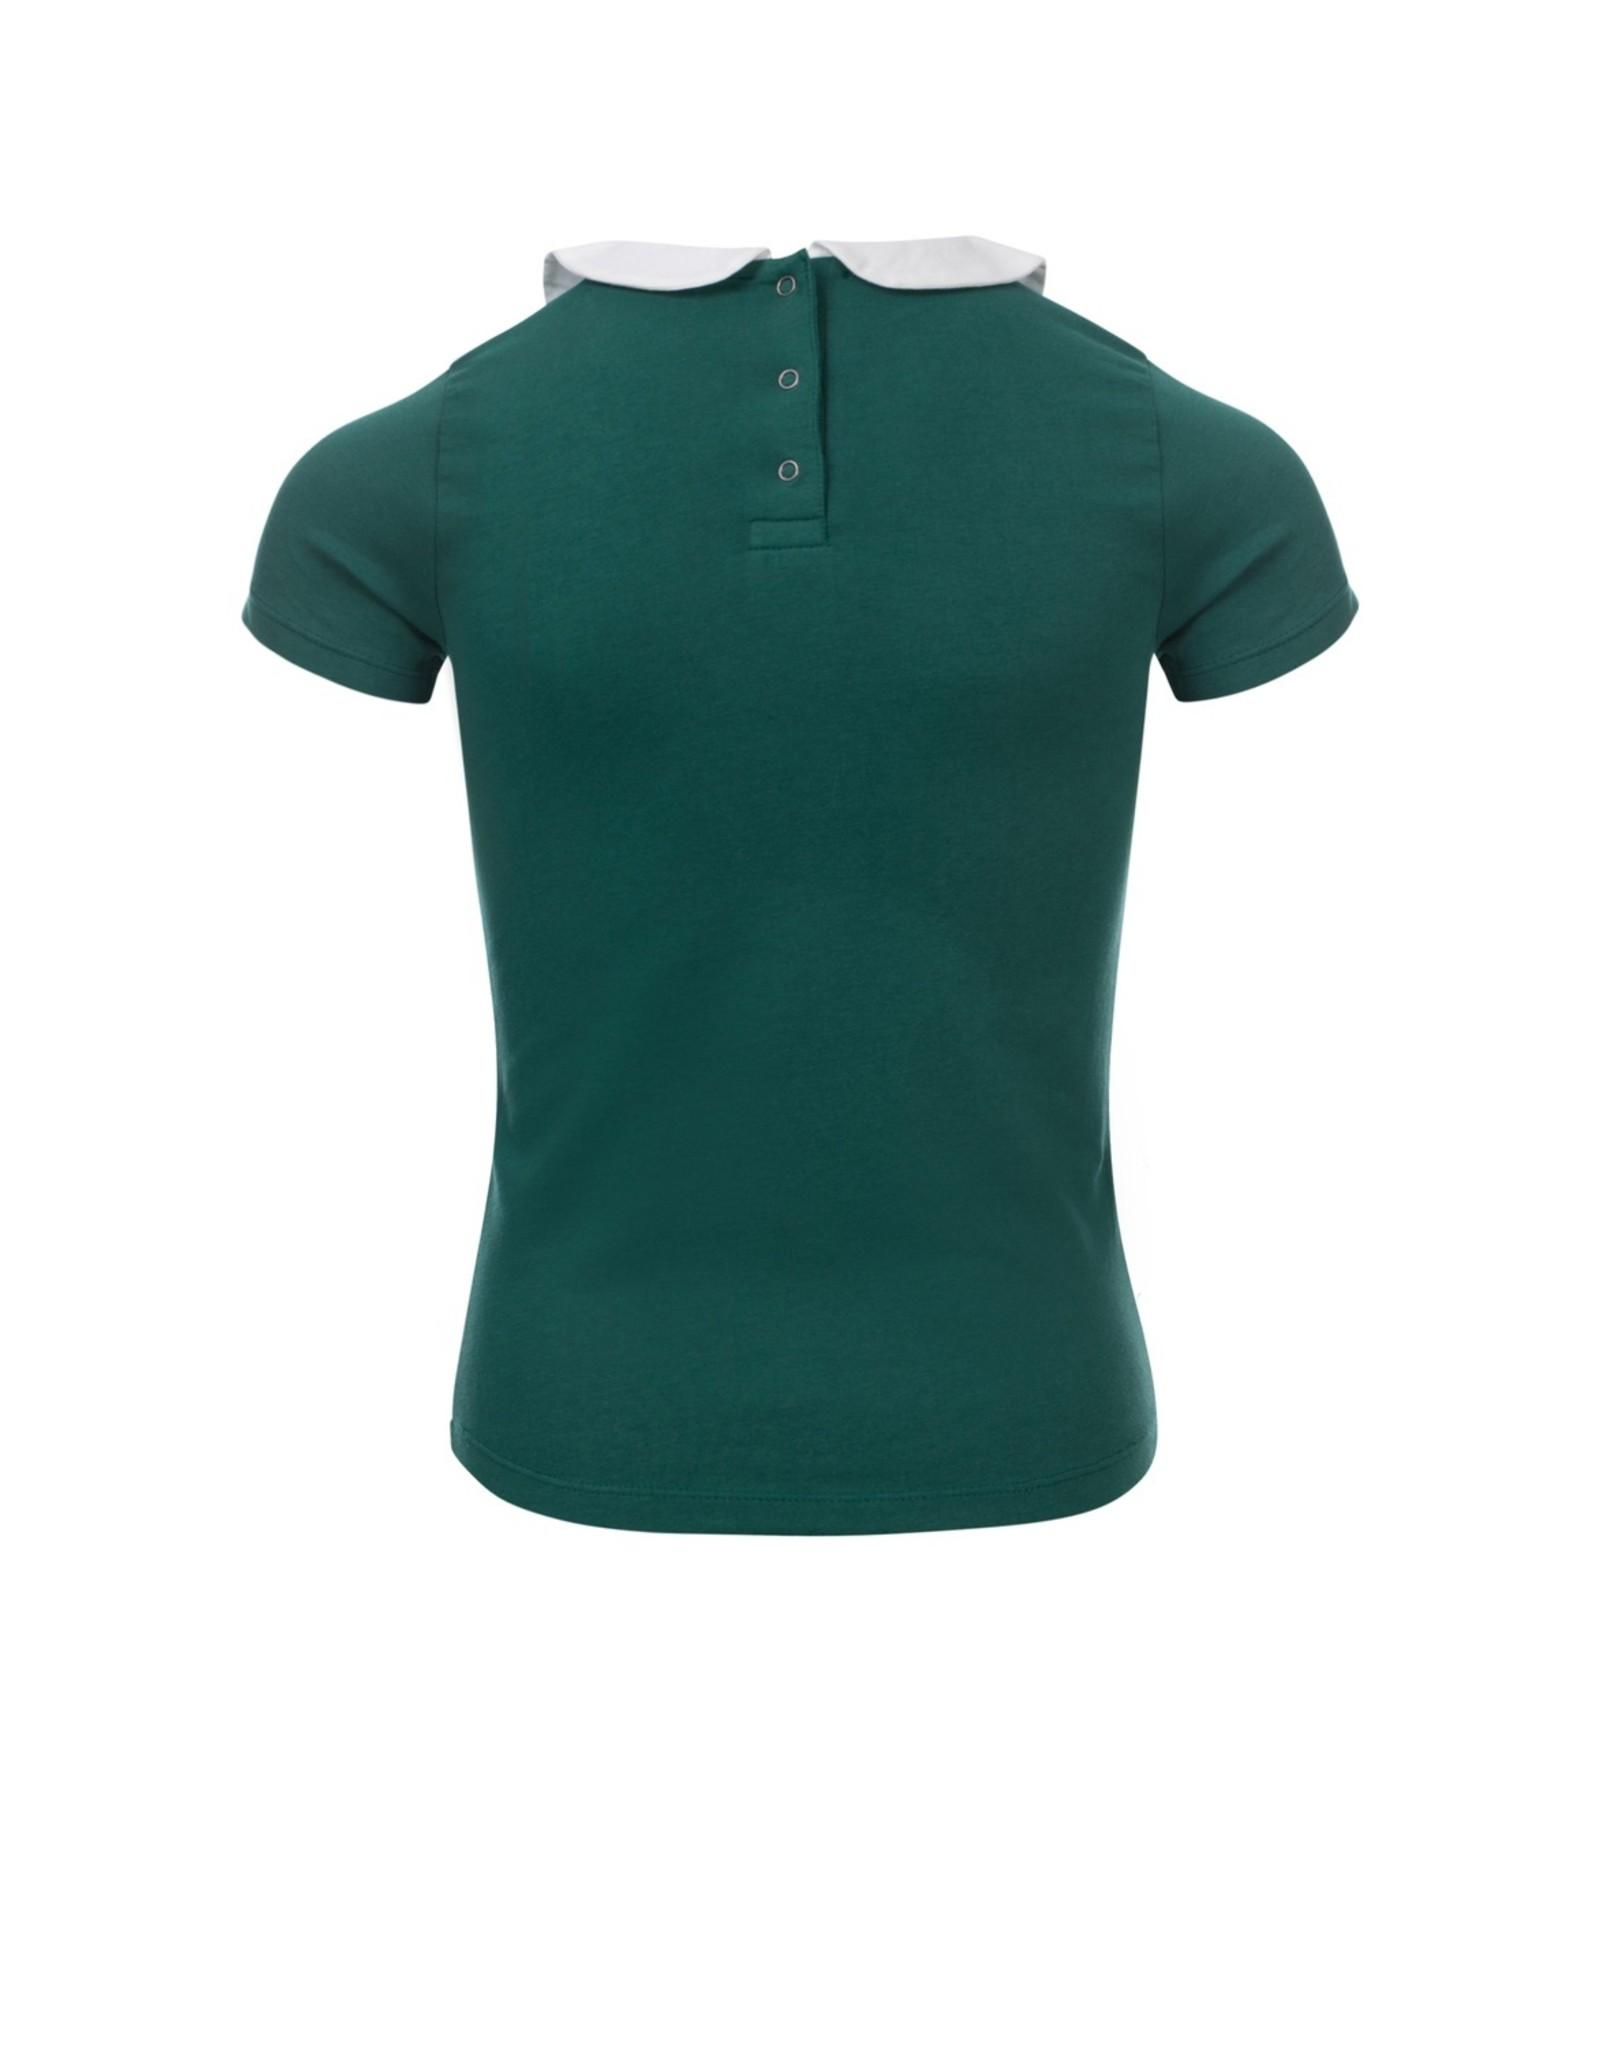 Looxs Revolution Little collar t-shirt s.s